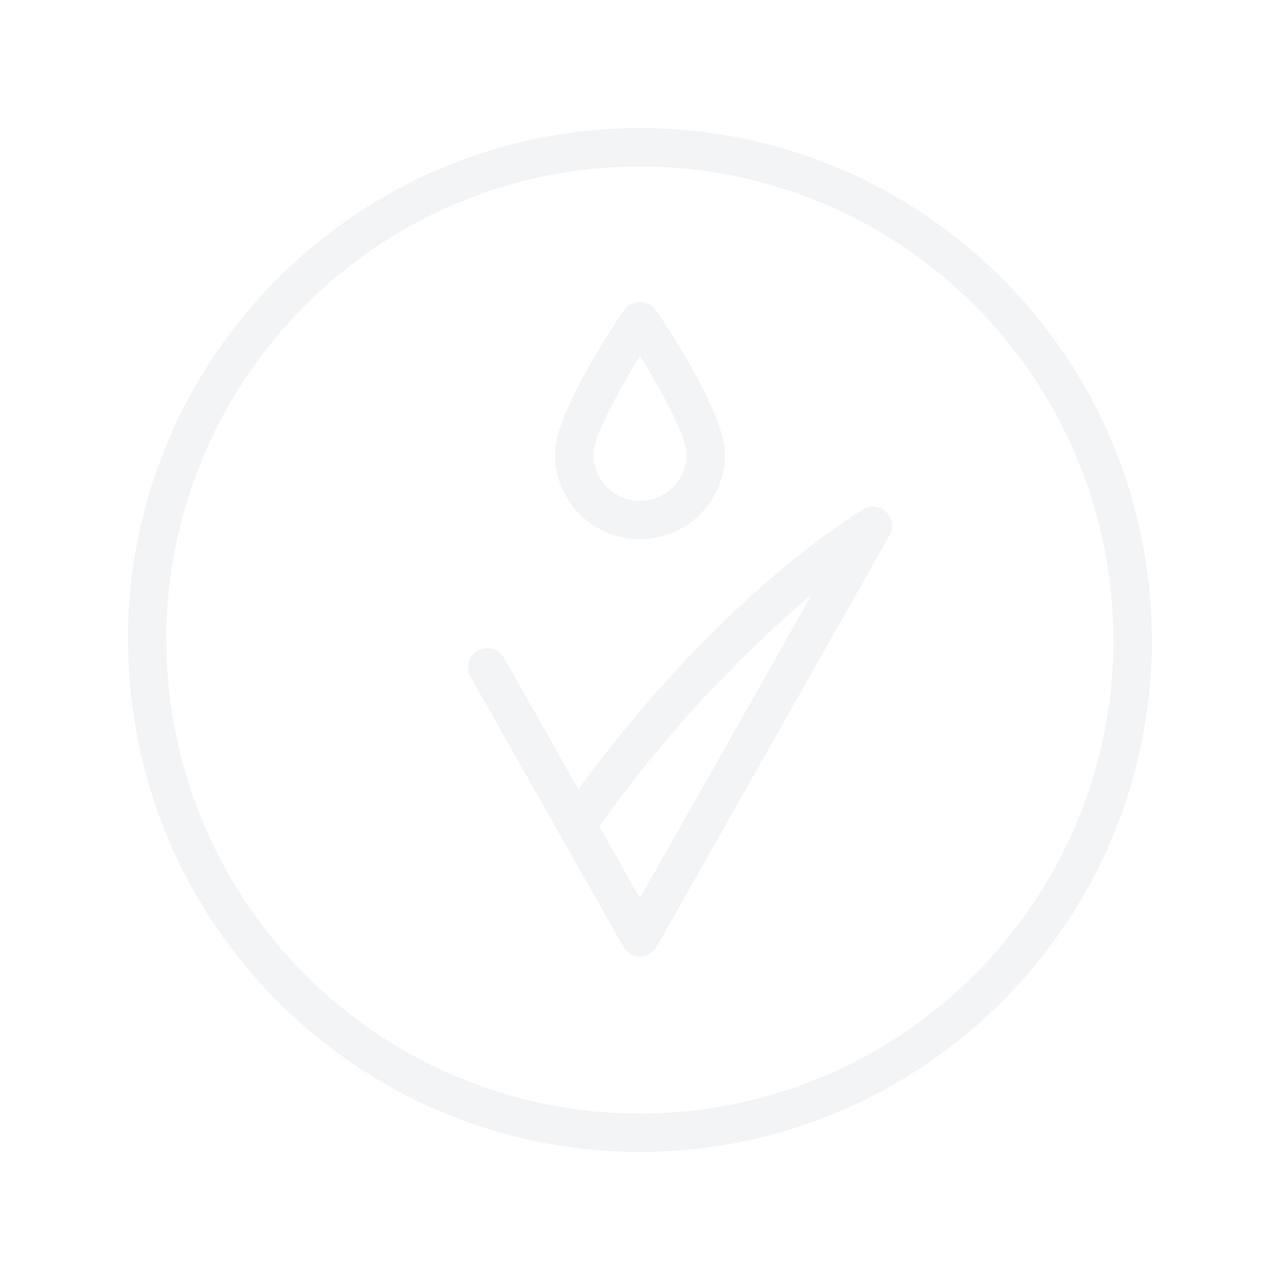 SCHWARZKOPF PROFESSIONAL Blond Me Keratin Restore Bonding Mask маска кератиновое восстановление 200ml